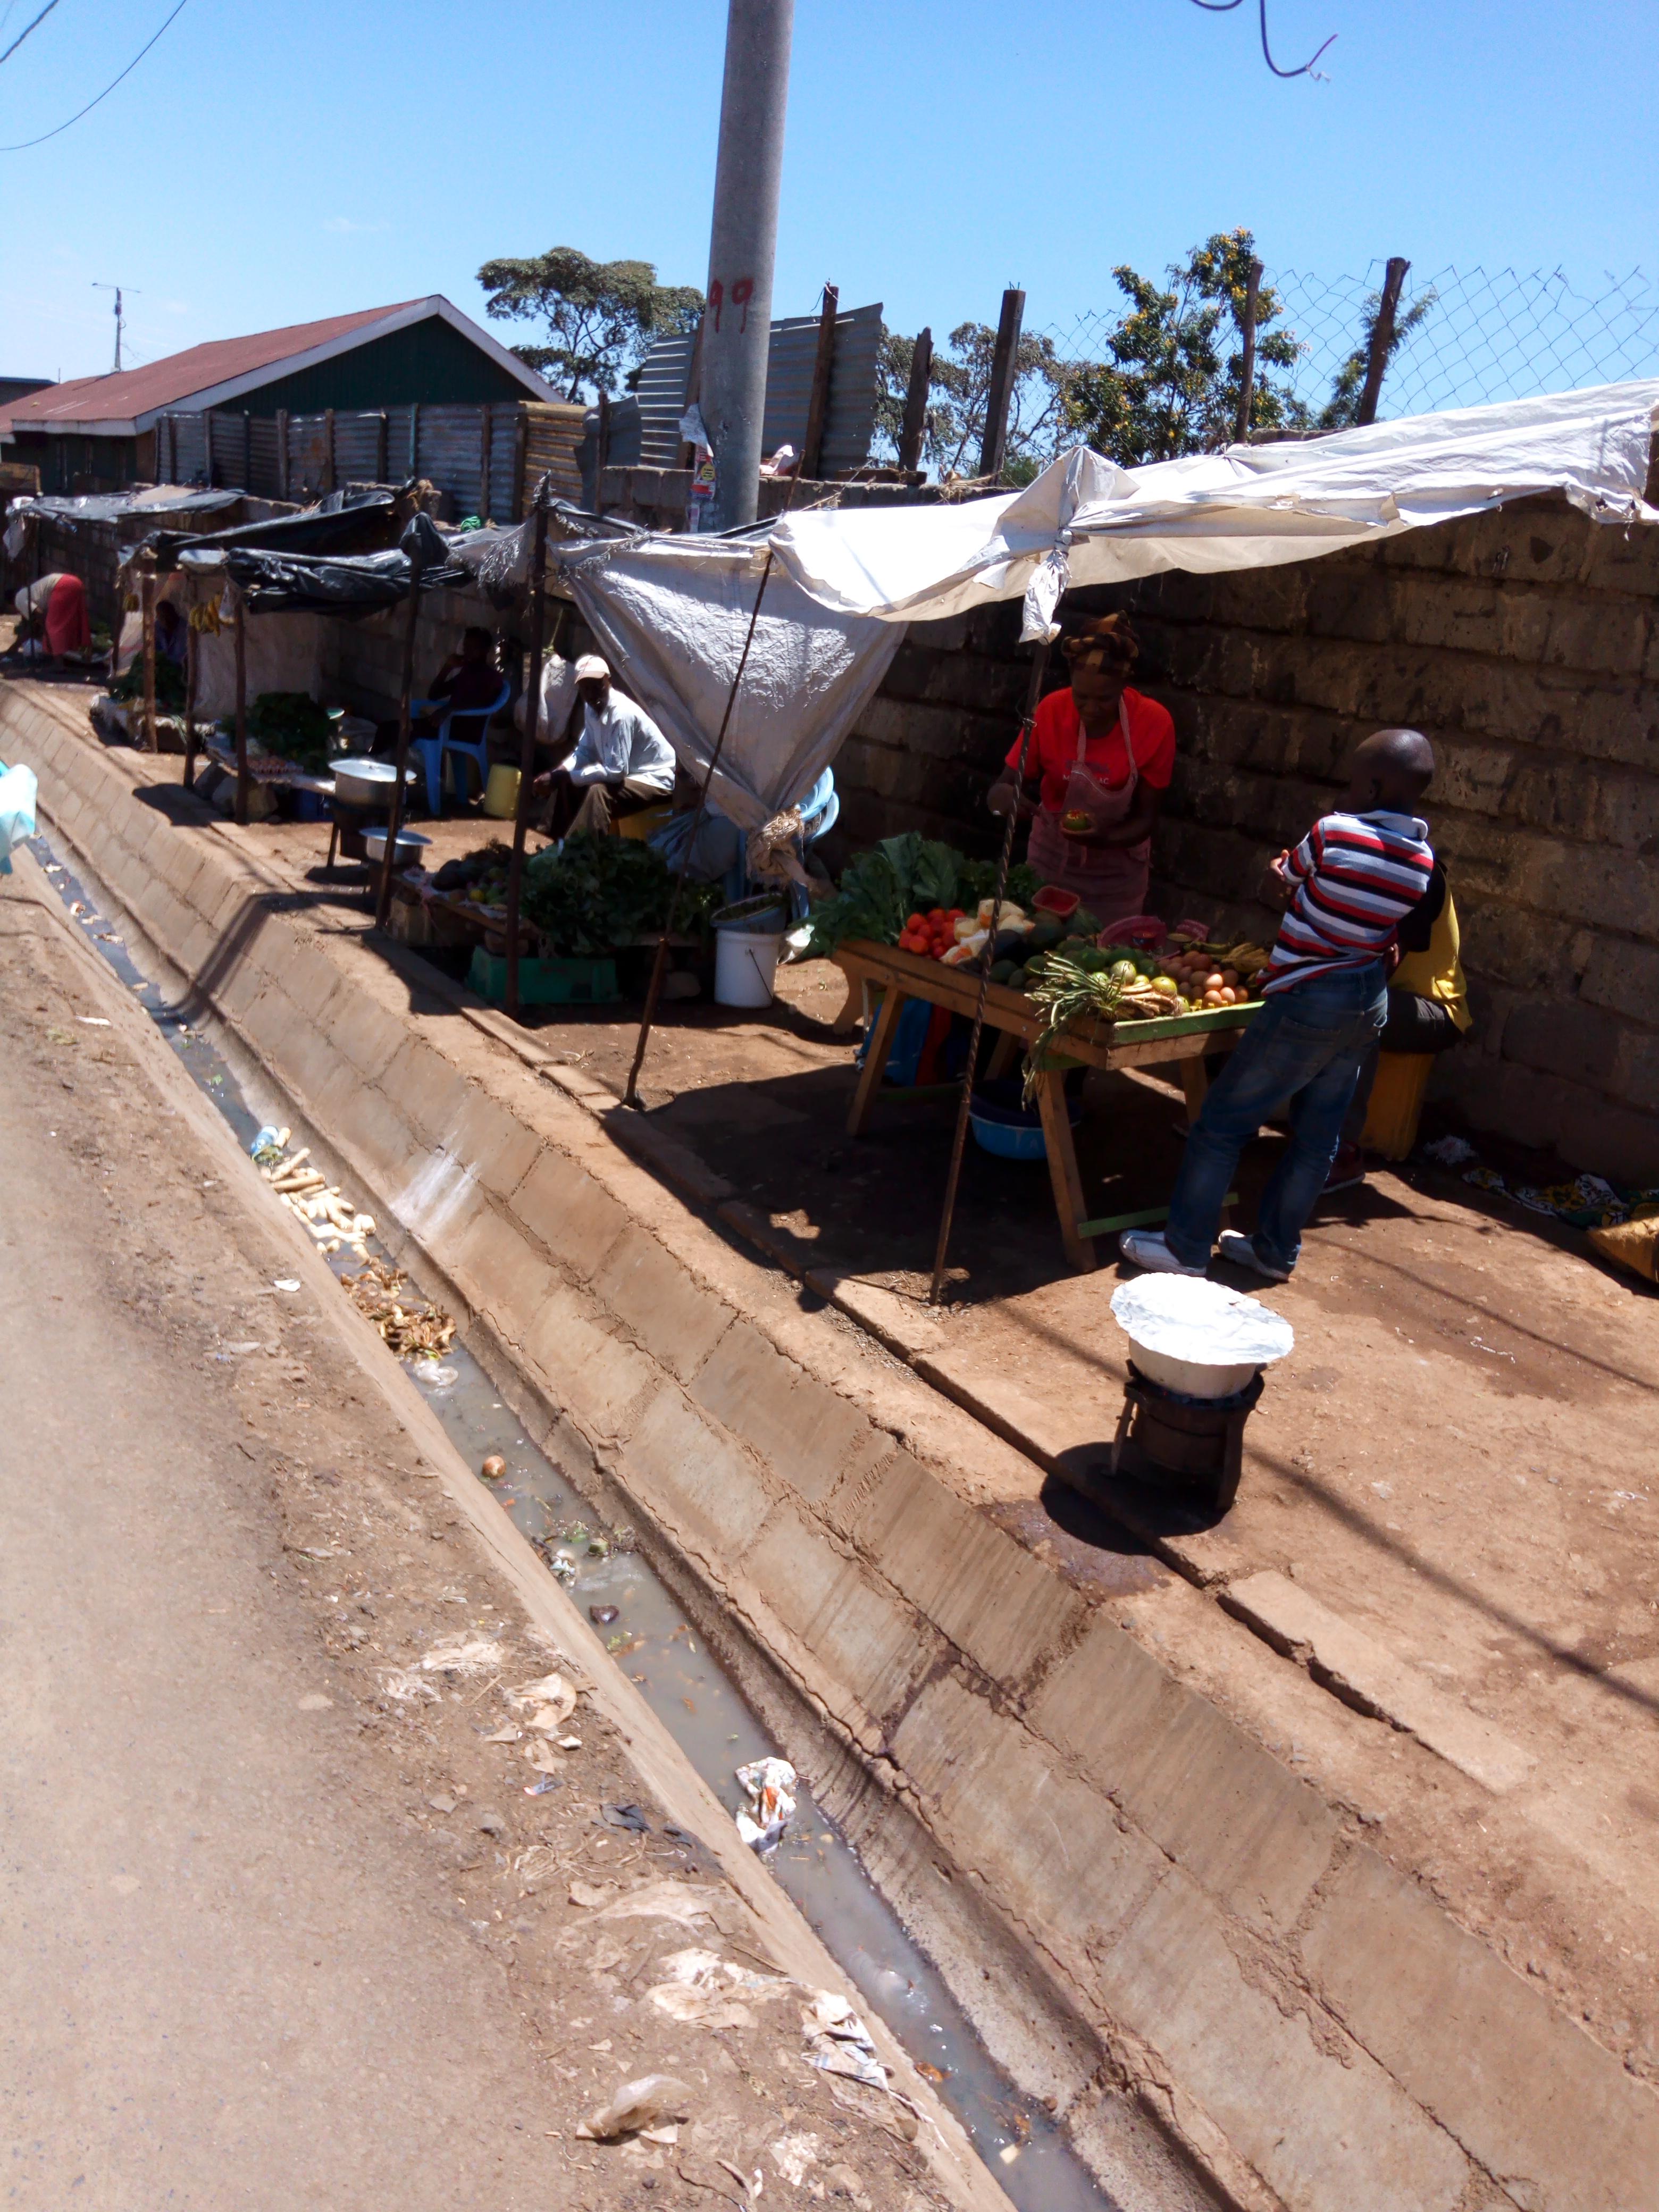 File:Fruits Selling in Kibra Nairobi jpg - Wikimedia Commons